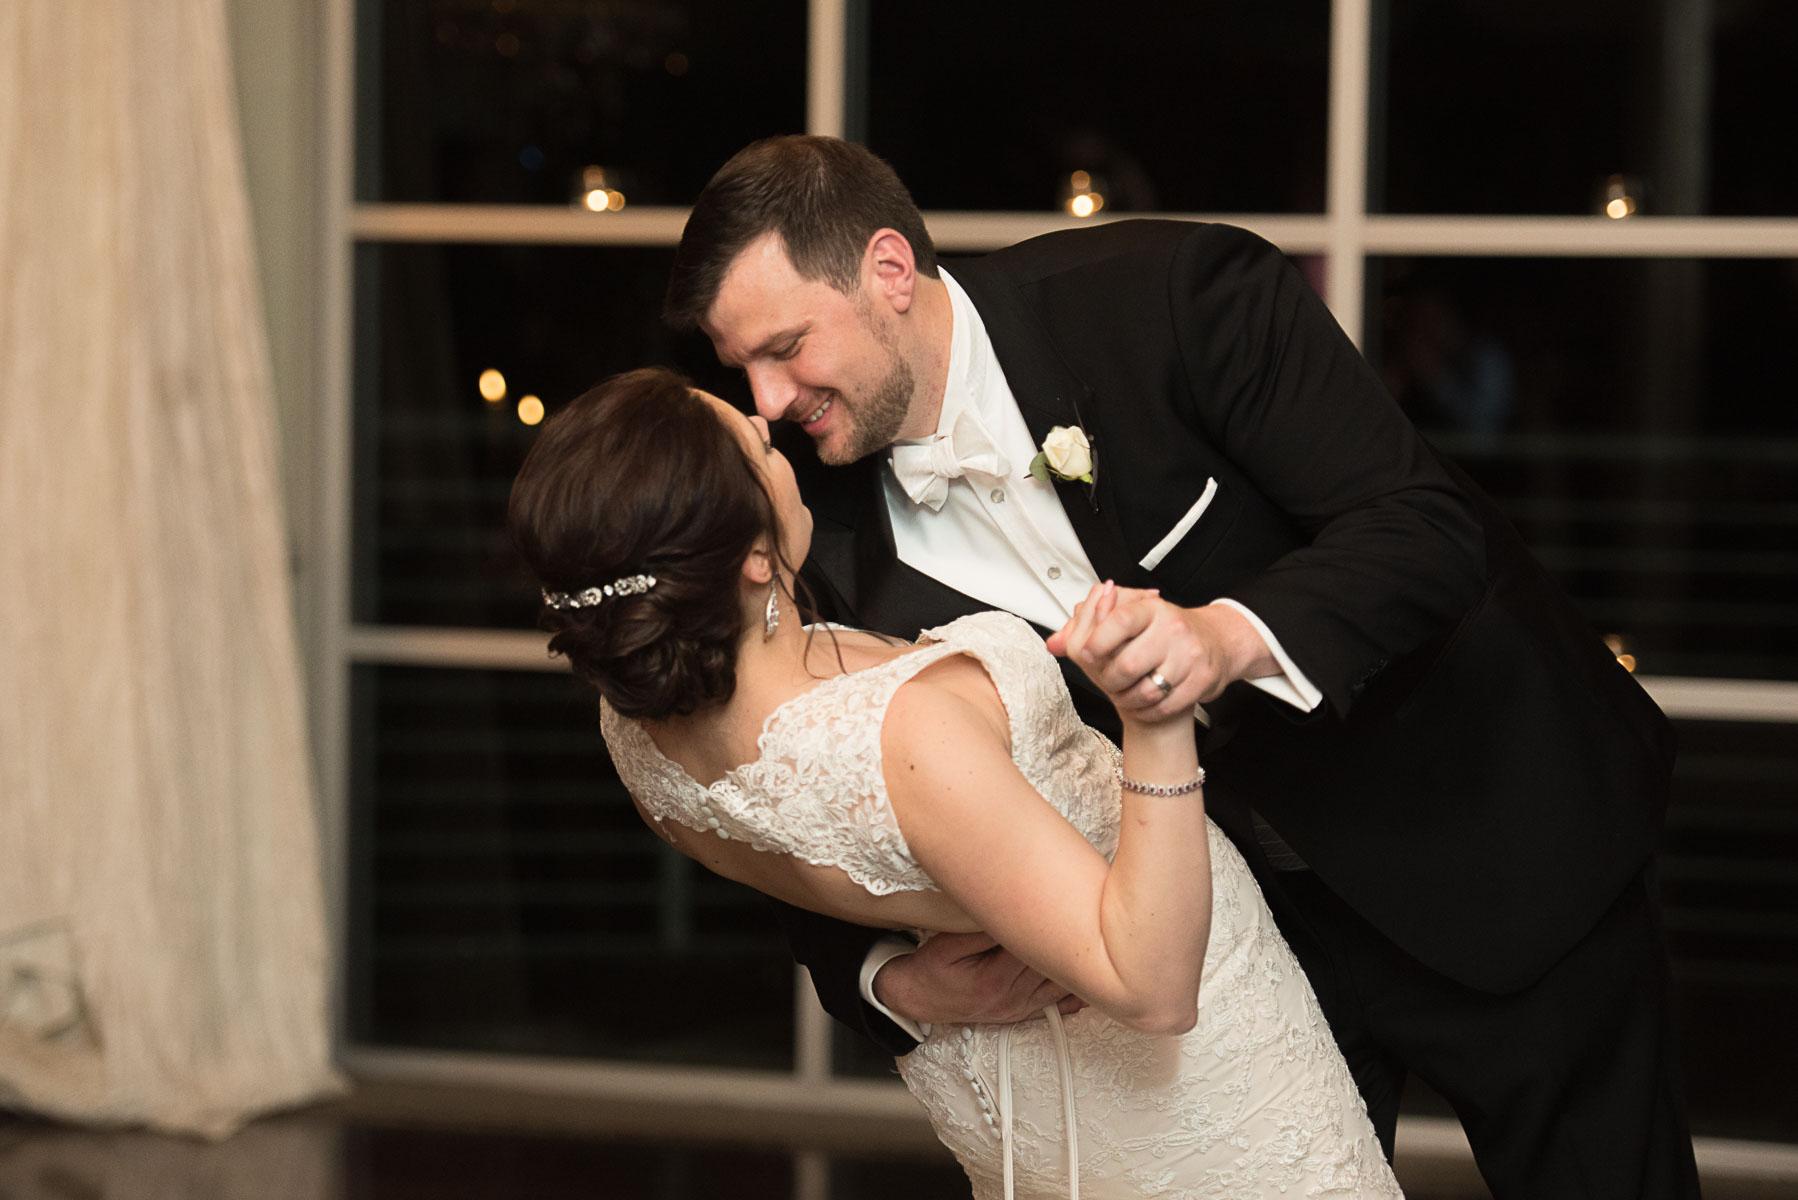 Austin Texas Wedding at the Terrace Club in Drippin Springs Fog in February-180.JPG